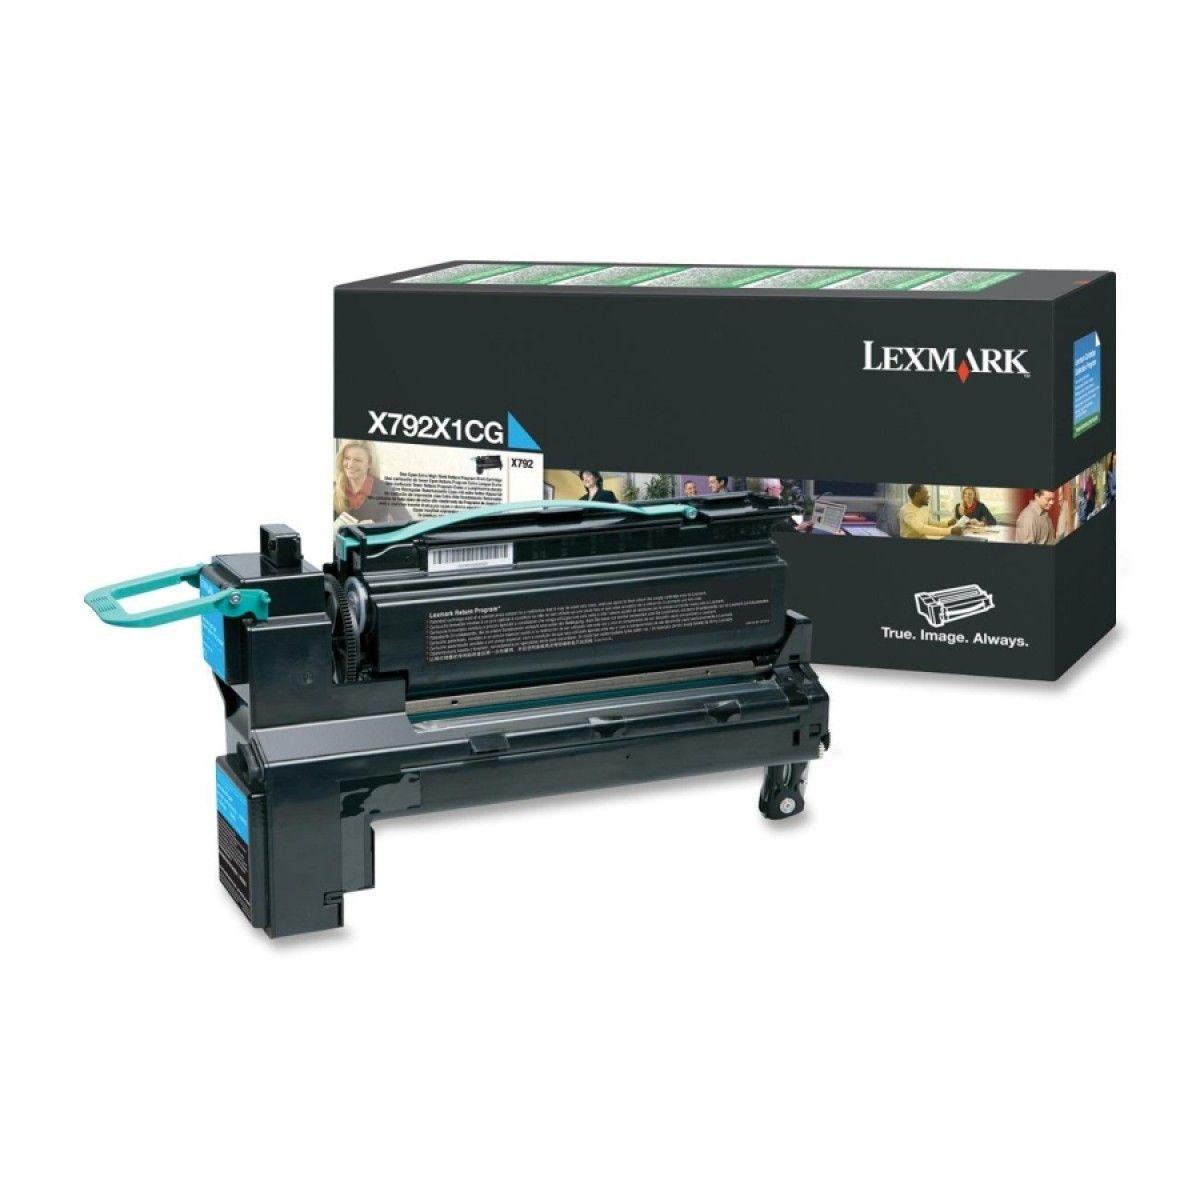 Toner Lexmark X792 Ciano - X792X1CG